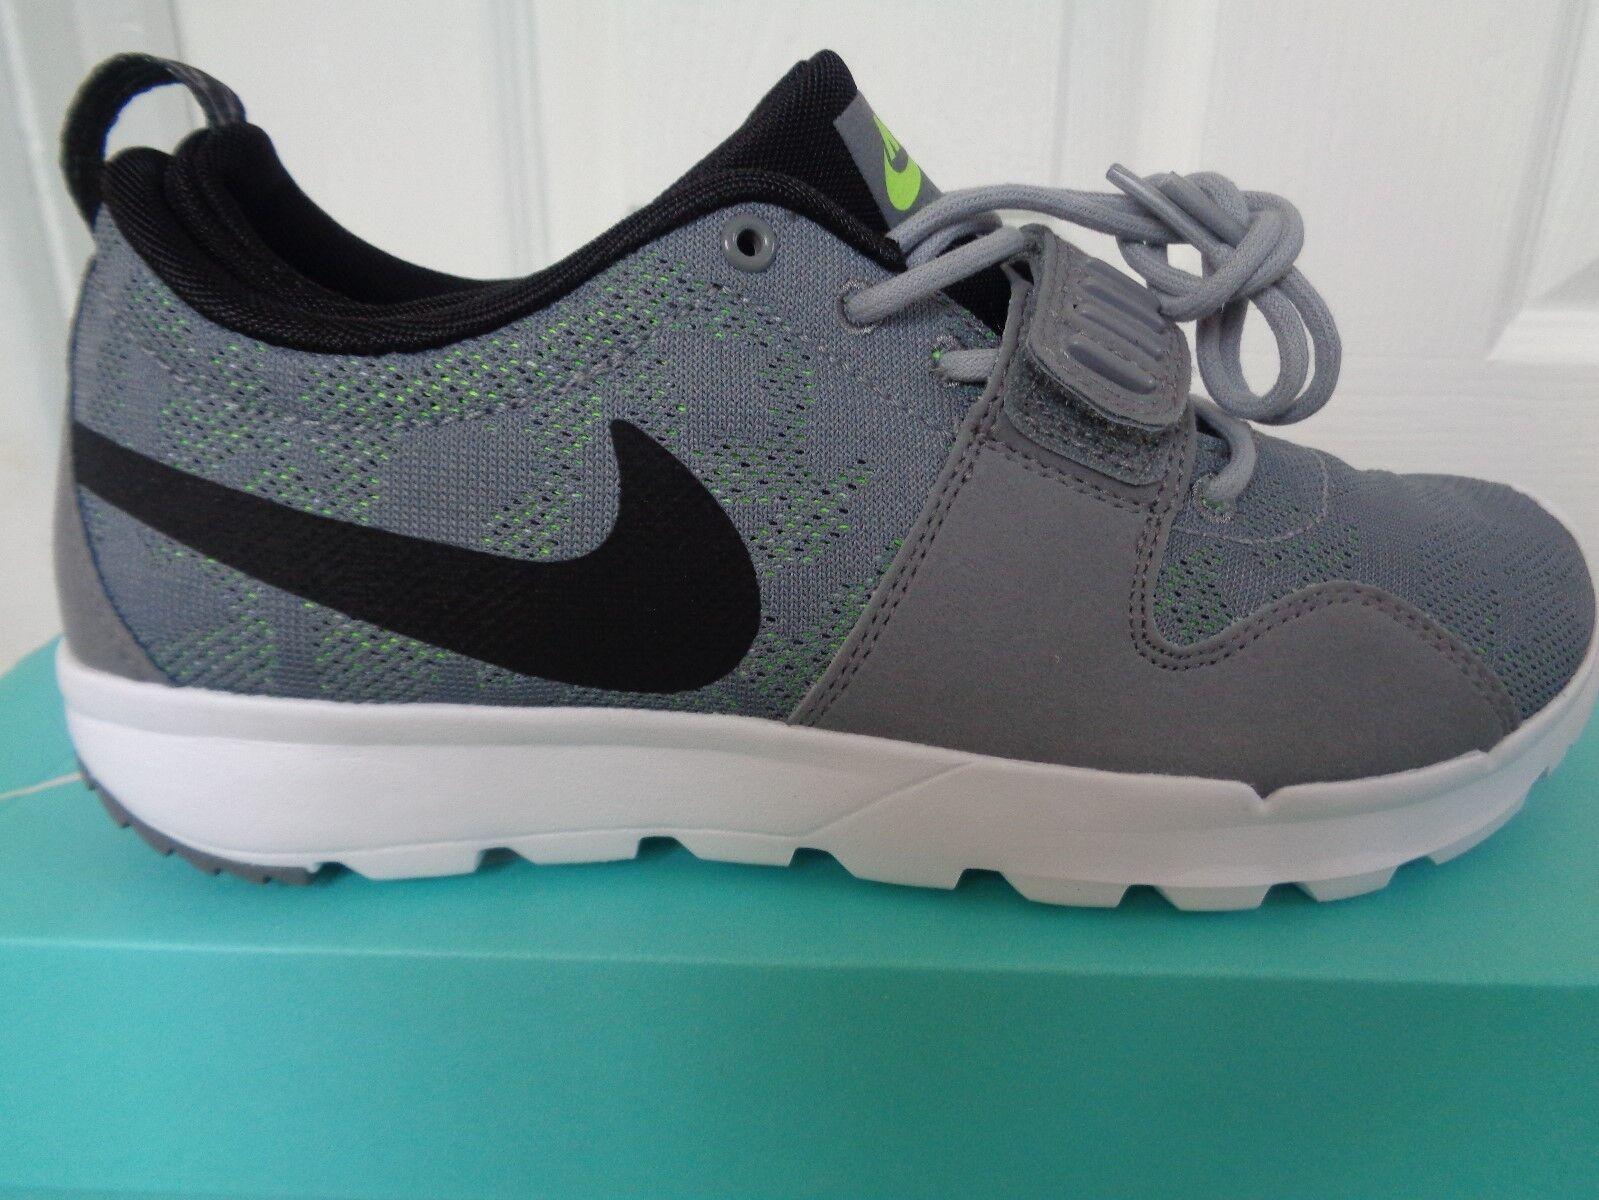 Nike SB Trainerendor Scarpe da Ginnastica Uomo Scarpe da ginnastica 616575 007 EU 40 US 7 Nuovo + Scatola